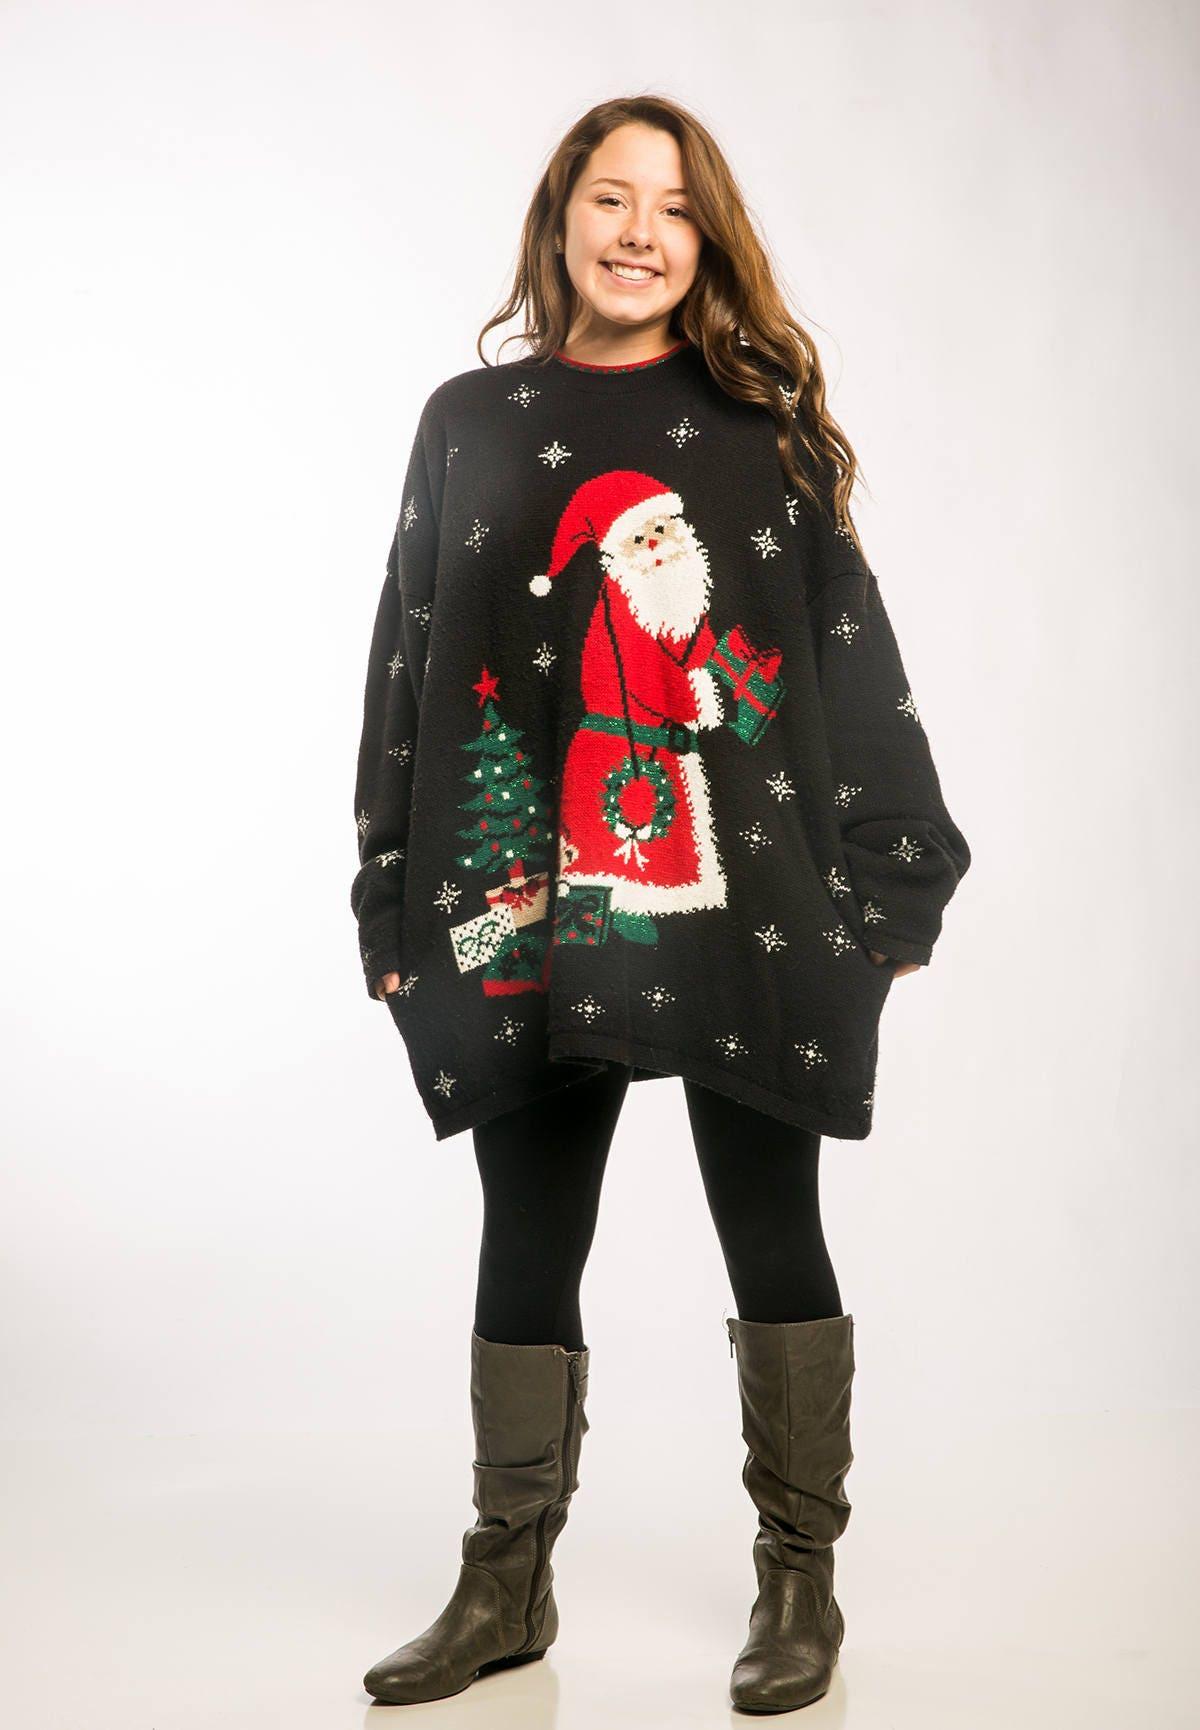 Oversized Vintage Ugly Christmas Sweater Santa Sweater Dress Metallic Green  SIZE XXXL